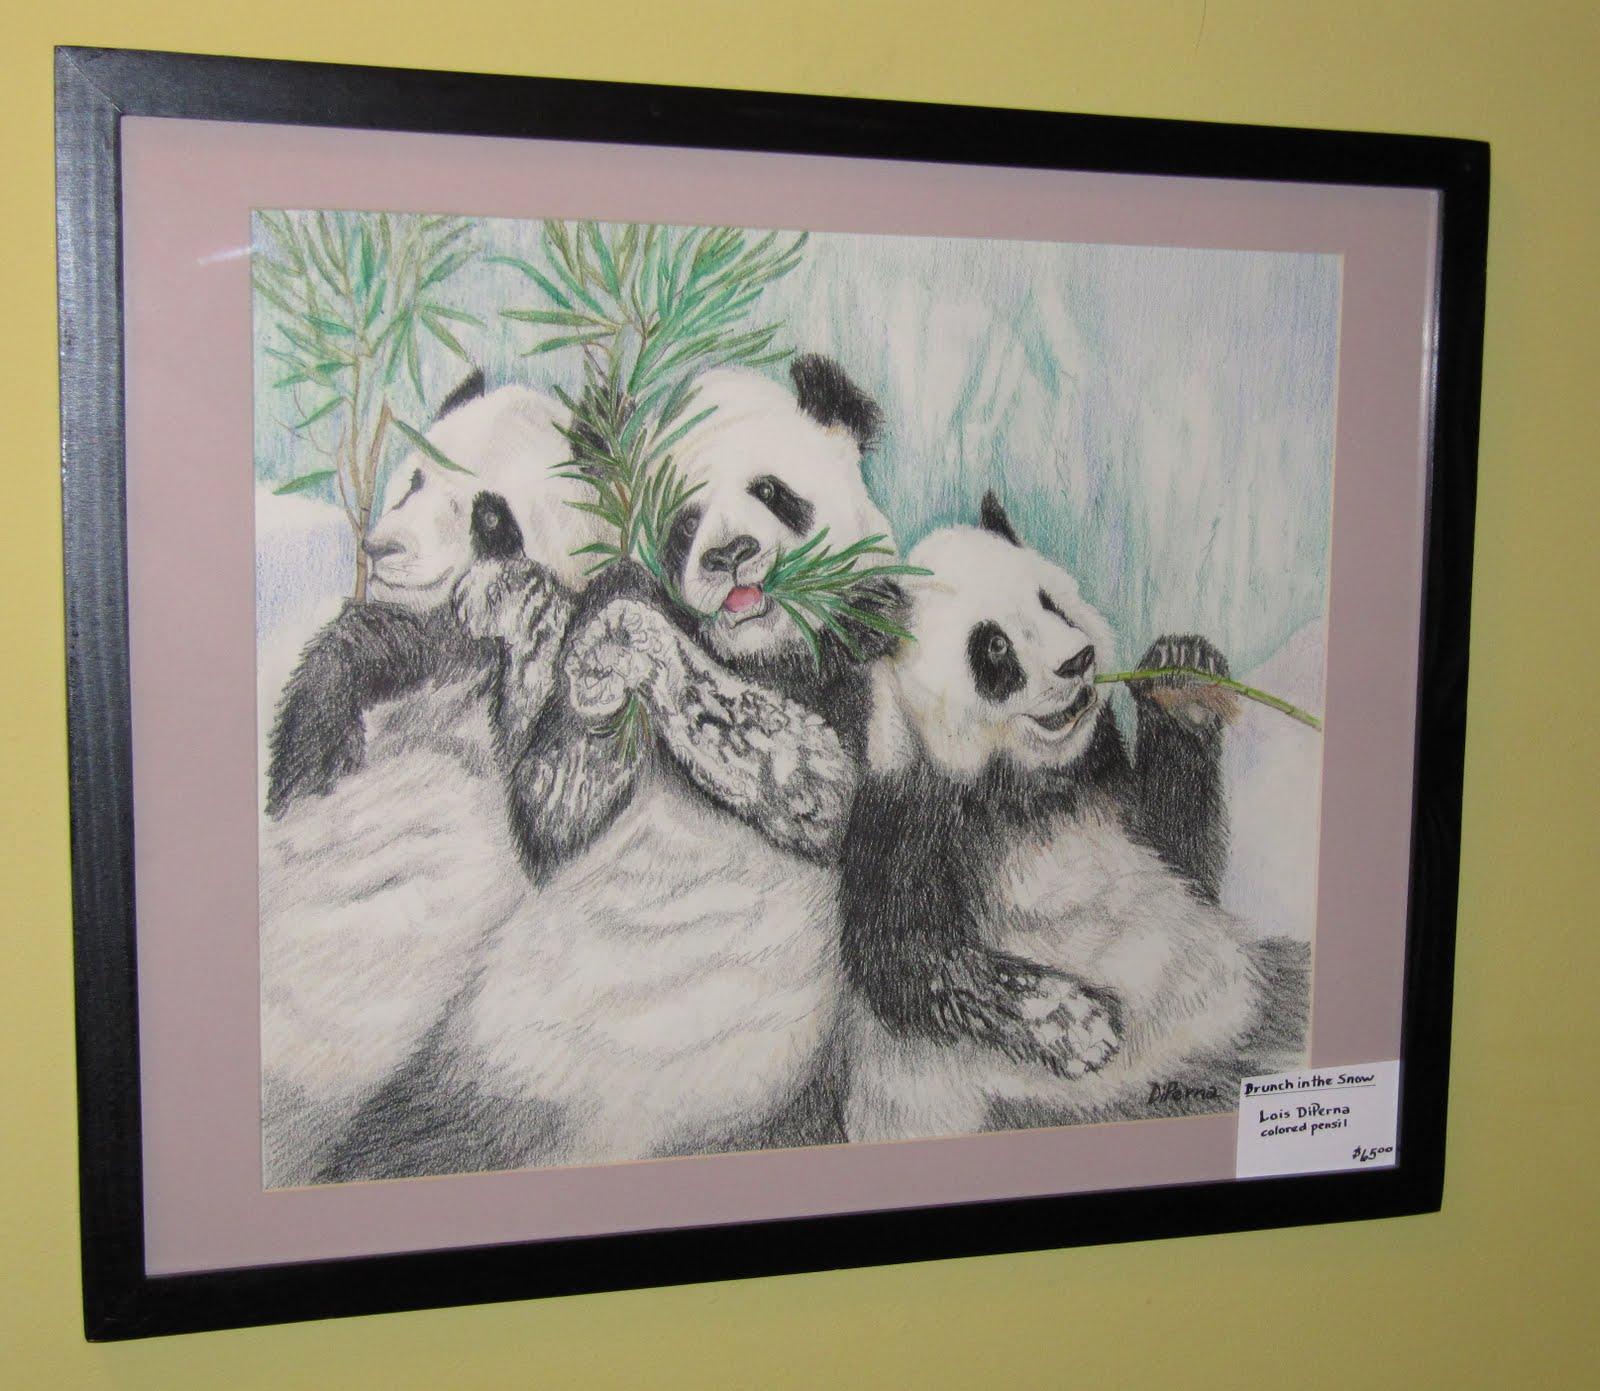 http://1.bp.blogspot.com/_u1XgCkPkr-8/TEjEcUupuiI/AAAAAAAAAls/oXY0CZ997fk/s1600/Pandas.jpg